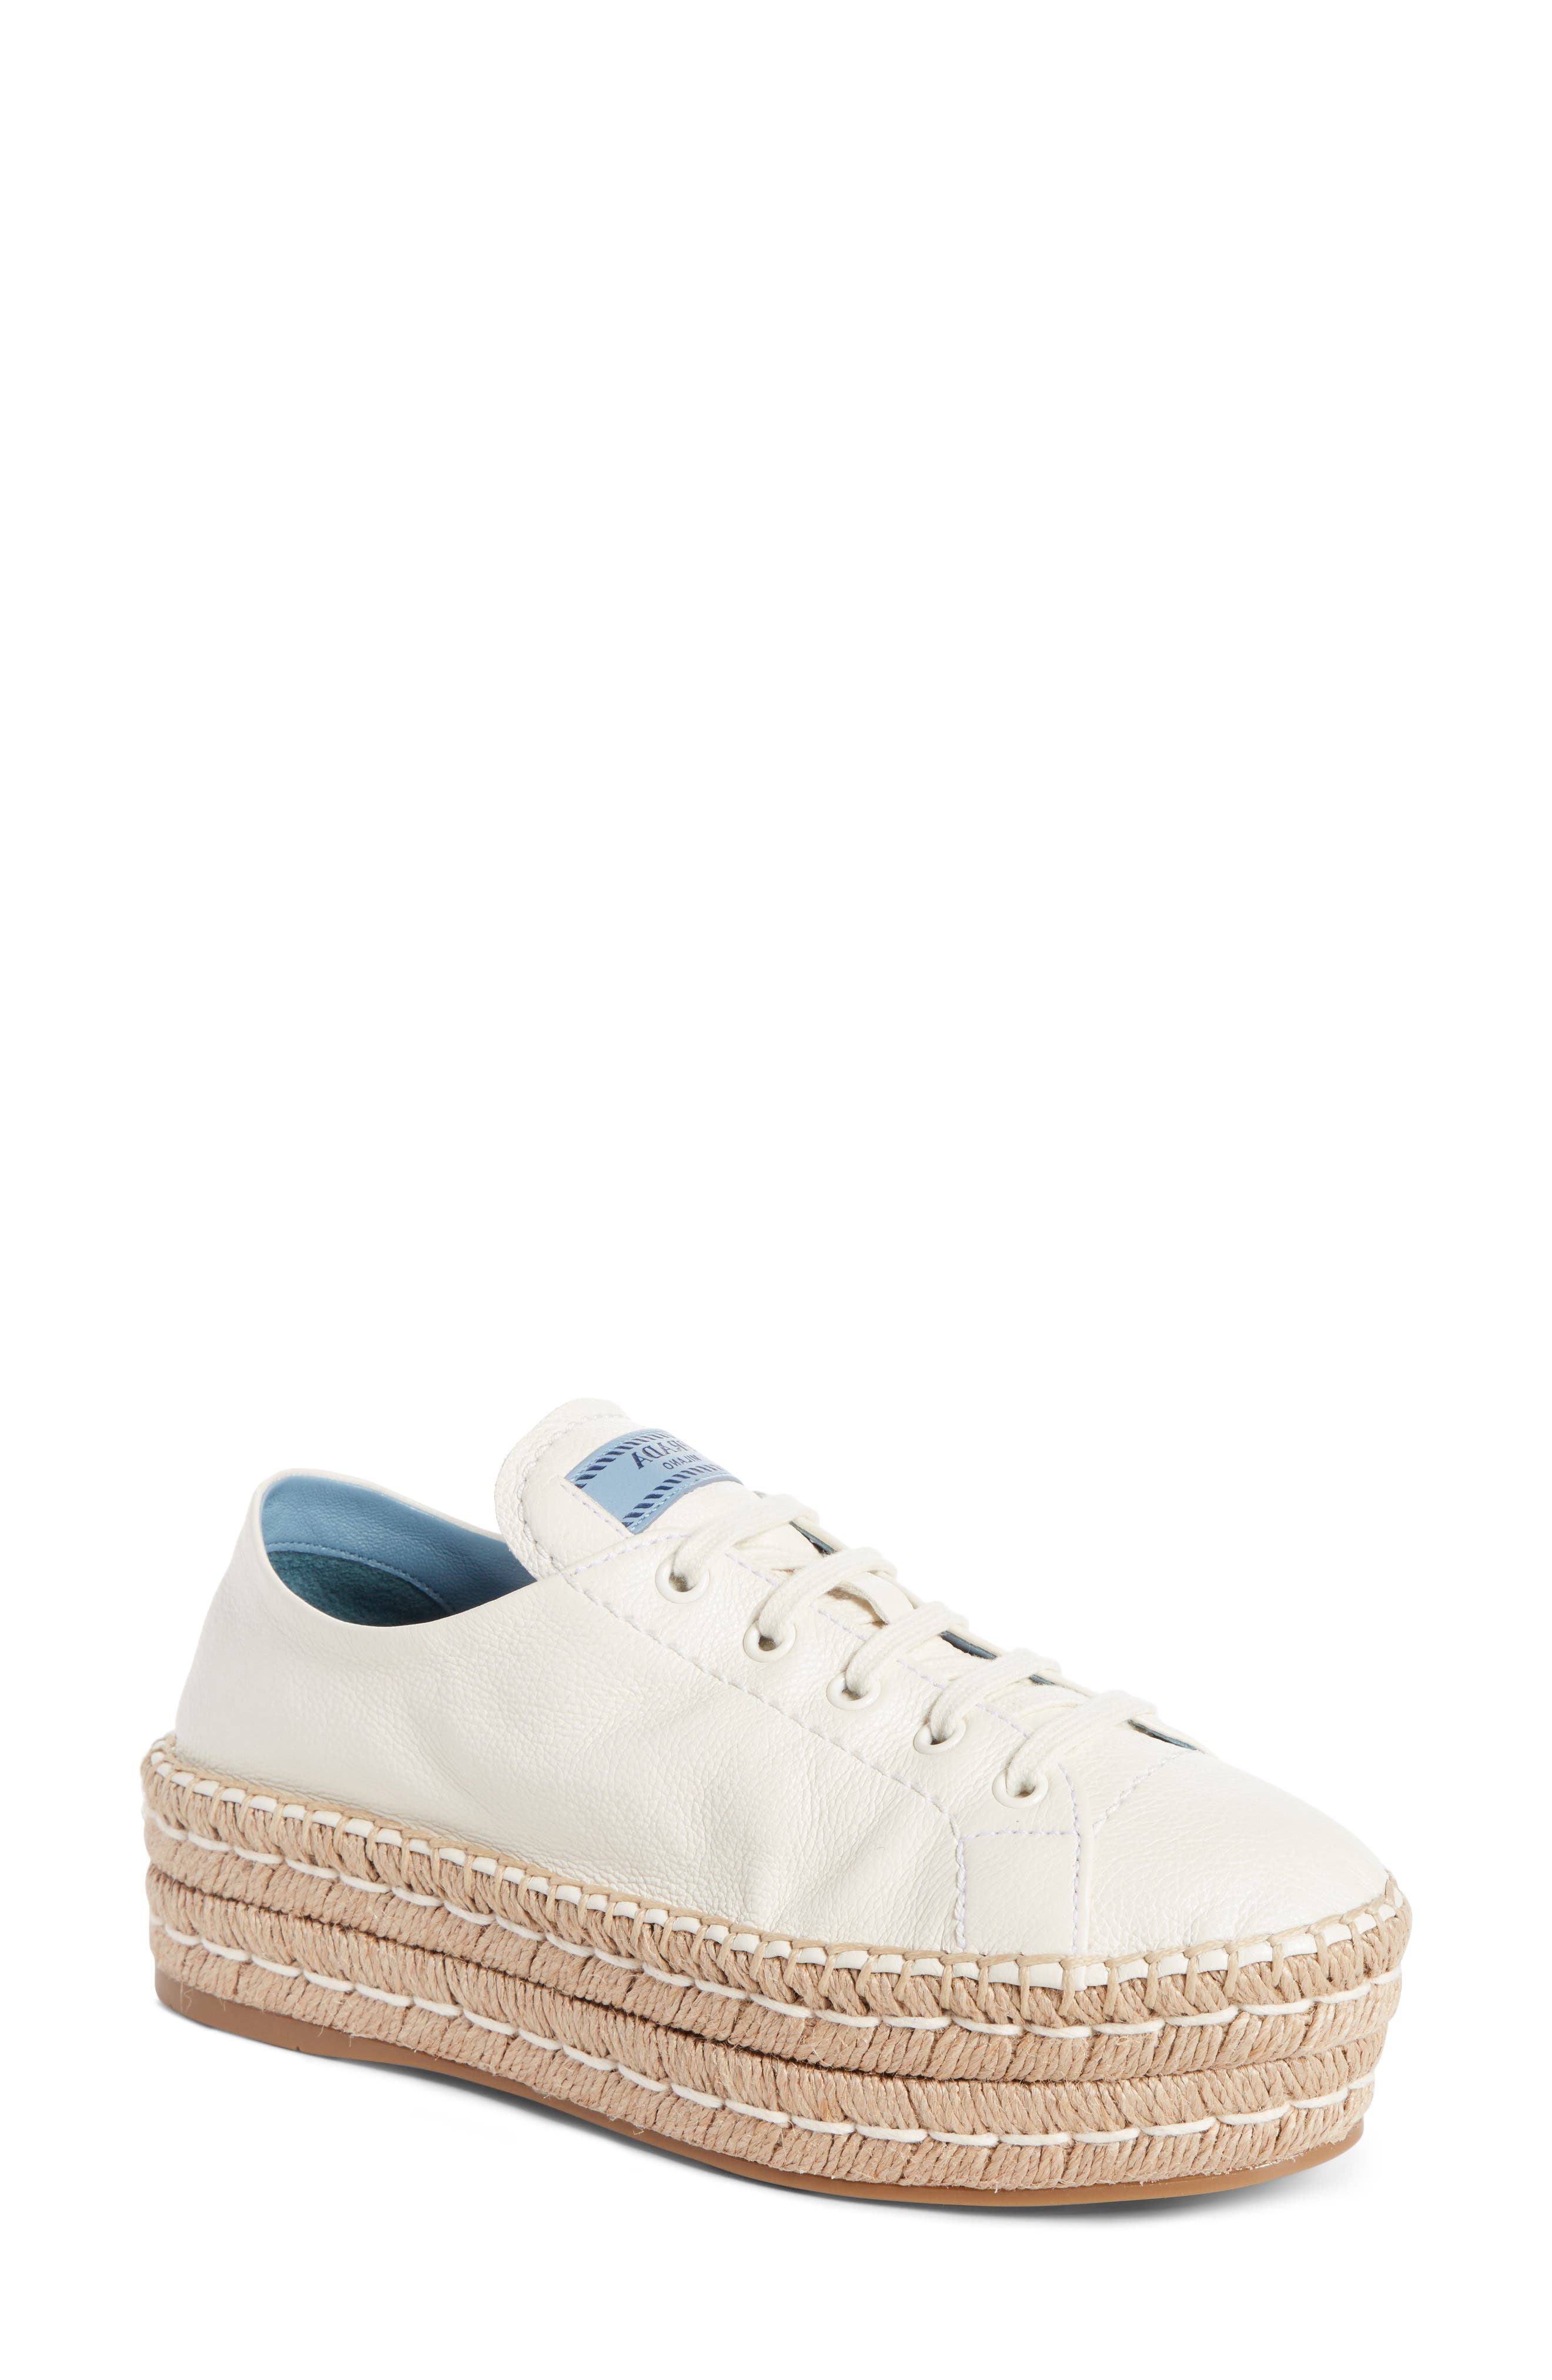 Flatform Espadrille Sneaker,                             Main thumbnail 1, color,                             White